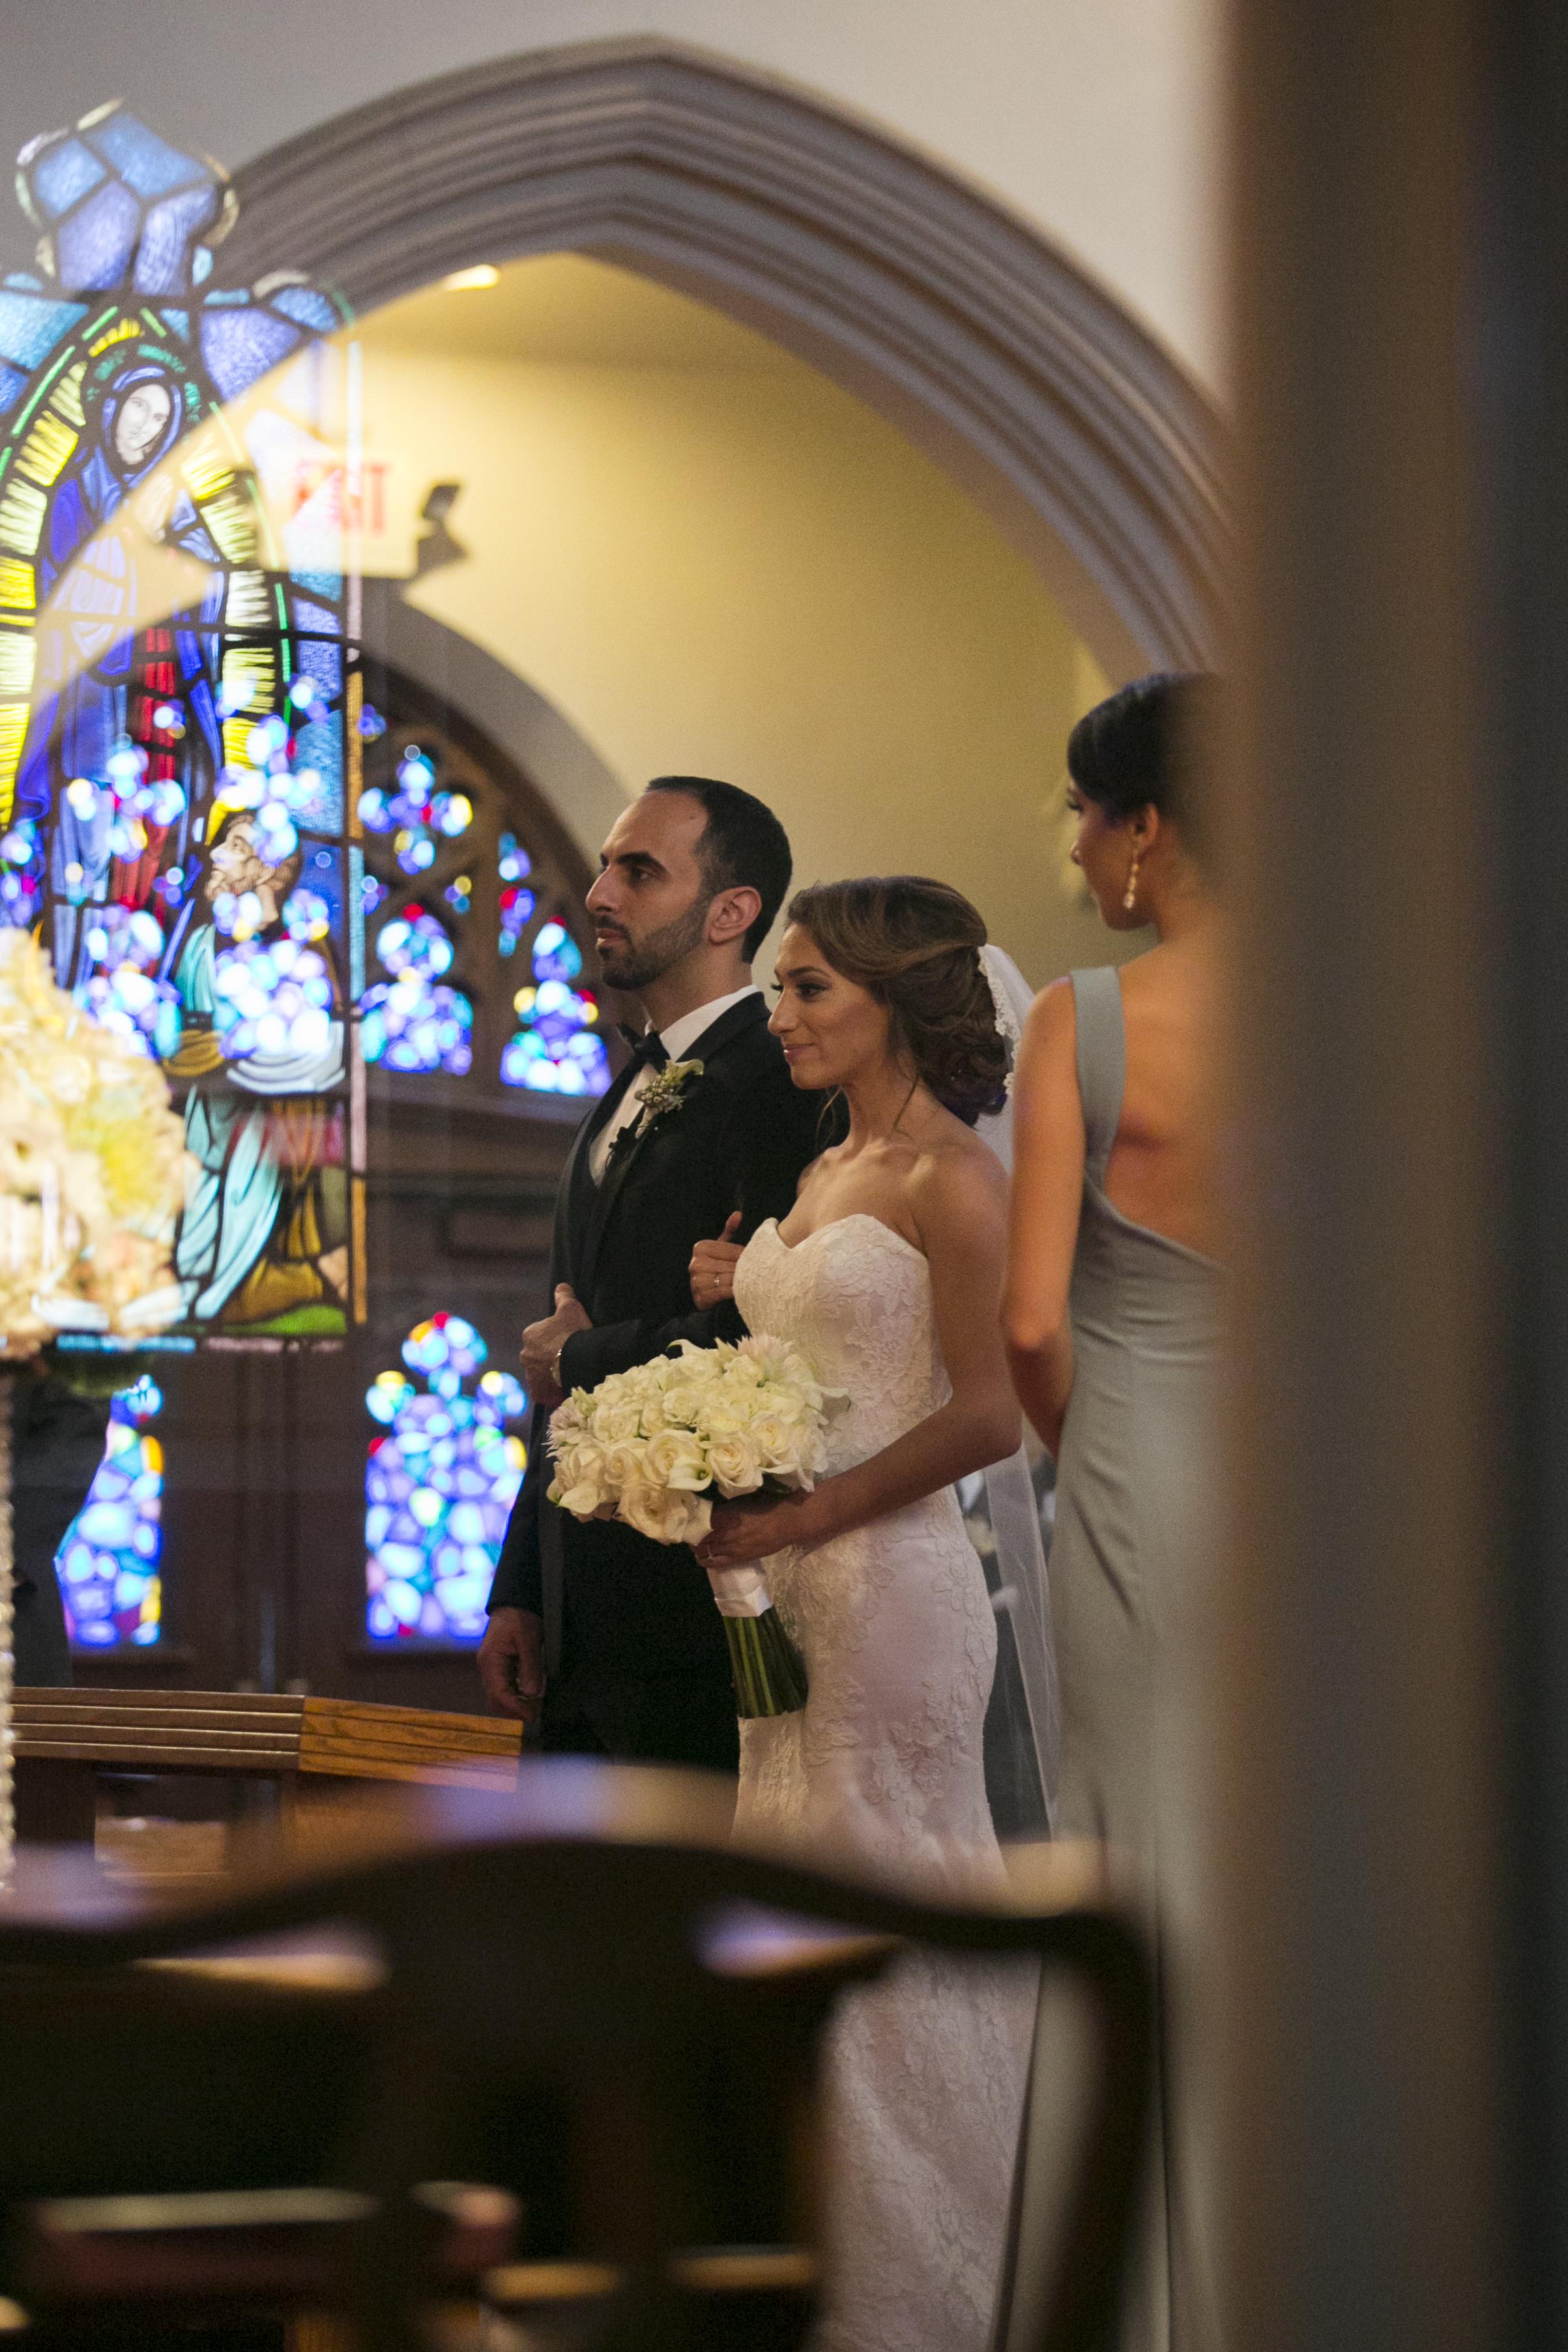 Persian Wedding-South San Francisco-Meo Baaklini21.jpg